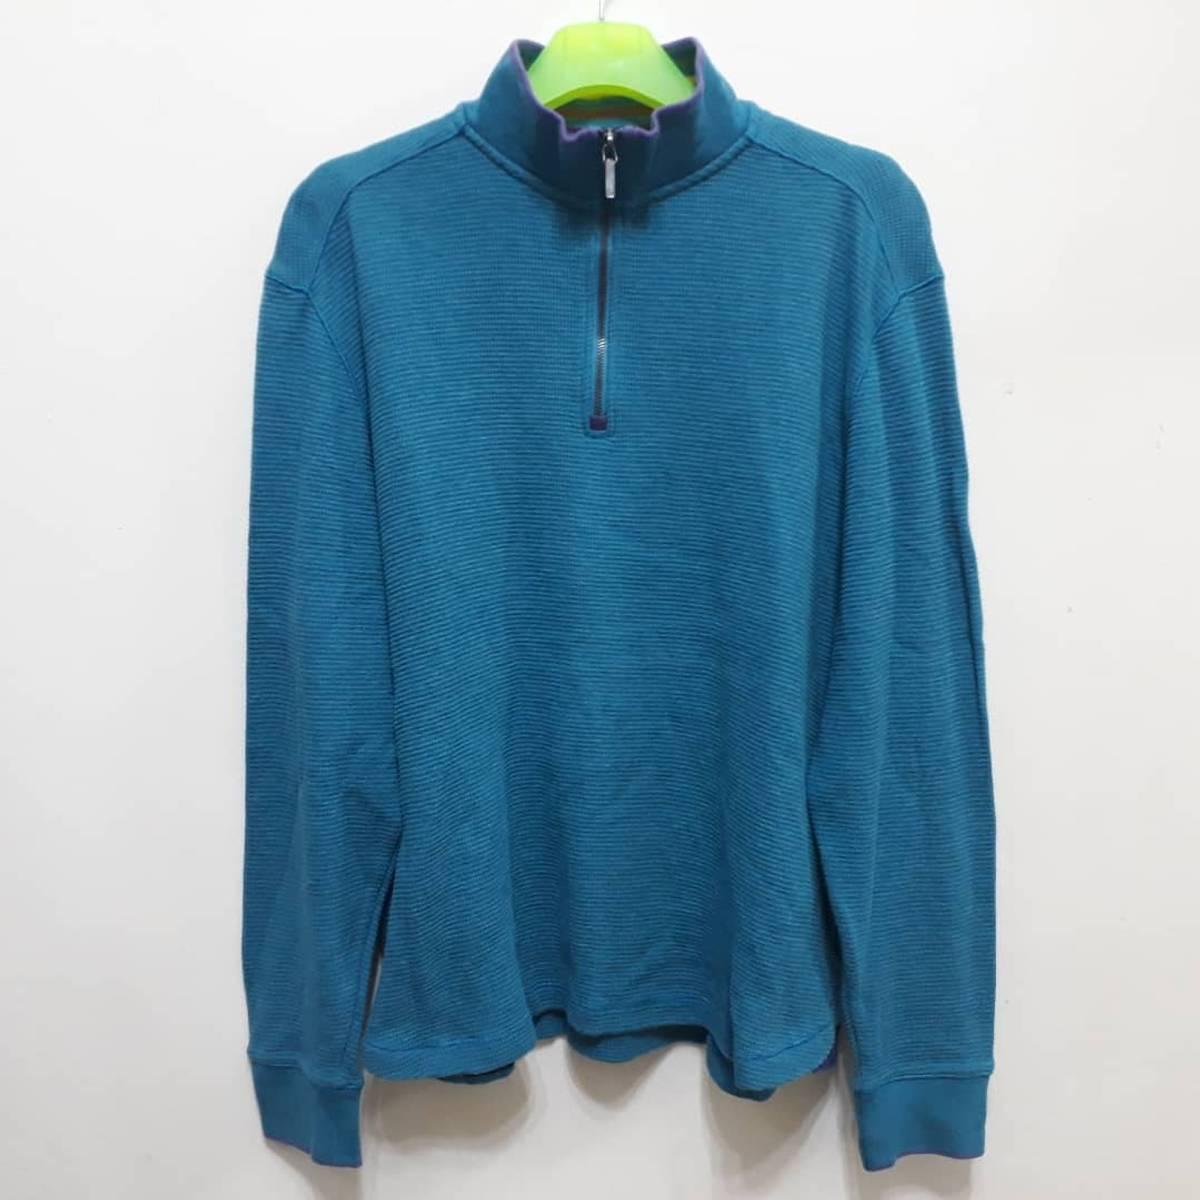 Robert Graham Robert Graham Sweater Shirt Pullover 1 4 Zip Tops Fashion Brand Designer Jumper Classic Fit Waffle Cotton Authentic Grailed